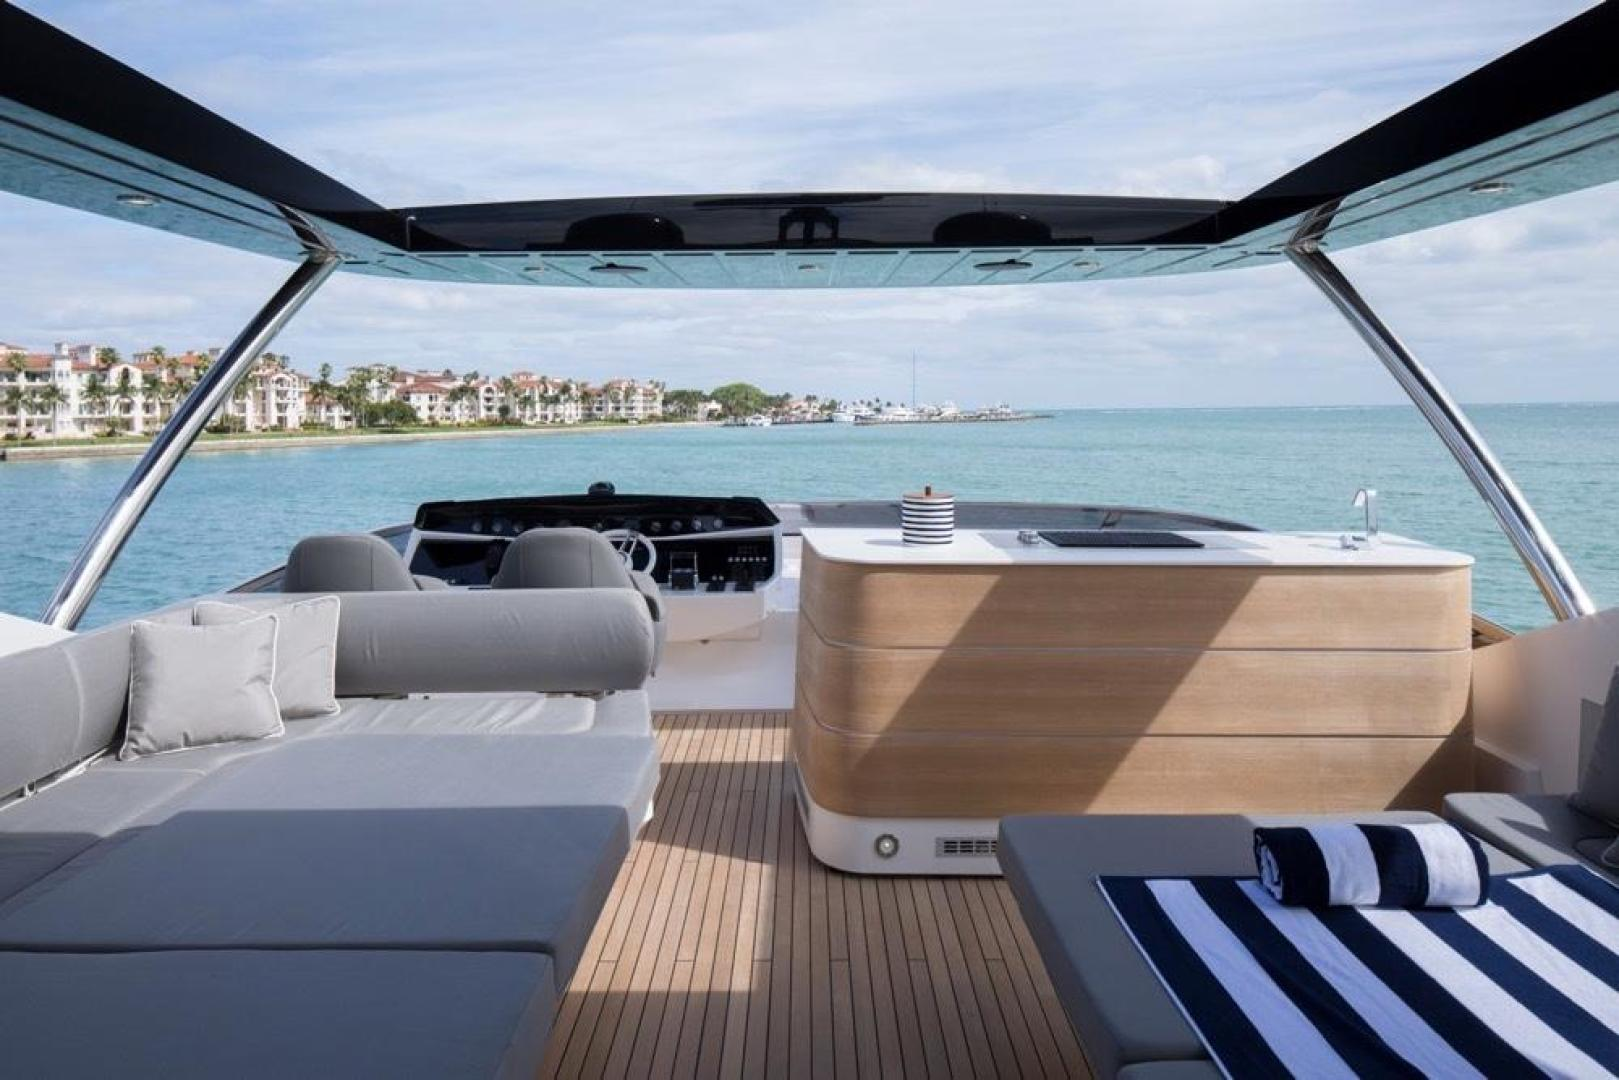 Sunseeker-28 Metre Yacht 2016-RIII Miami-Florida-United States-600123 | Thumbnail